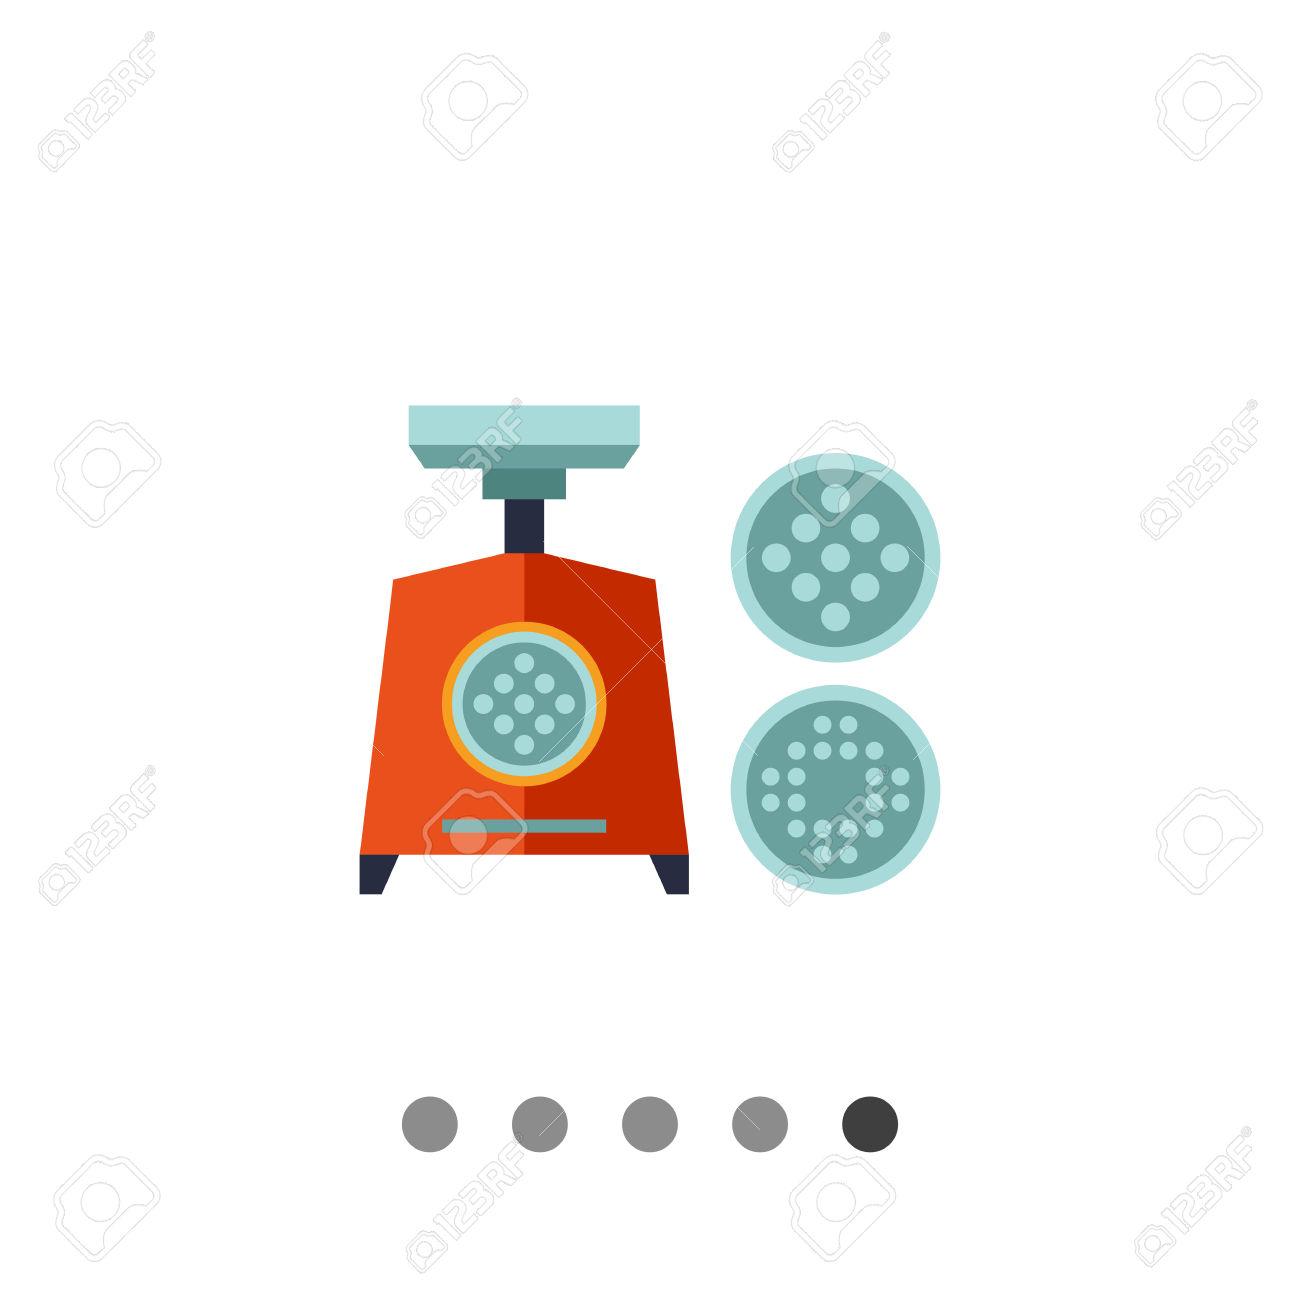 Mincing machine clipart #13